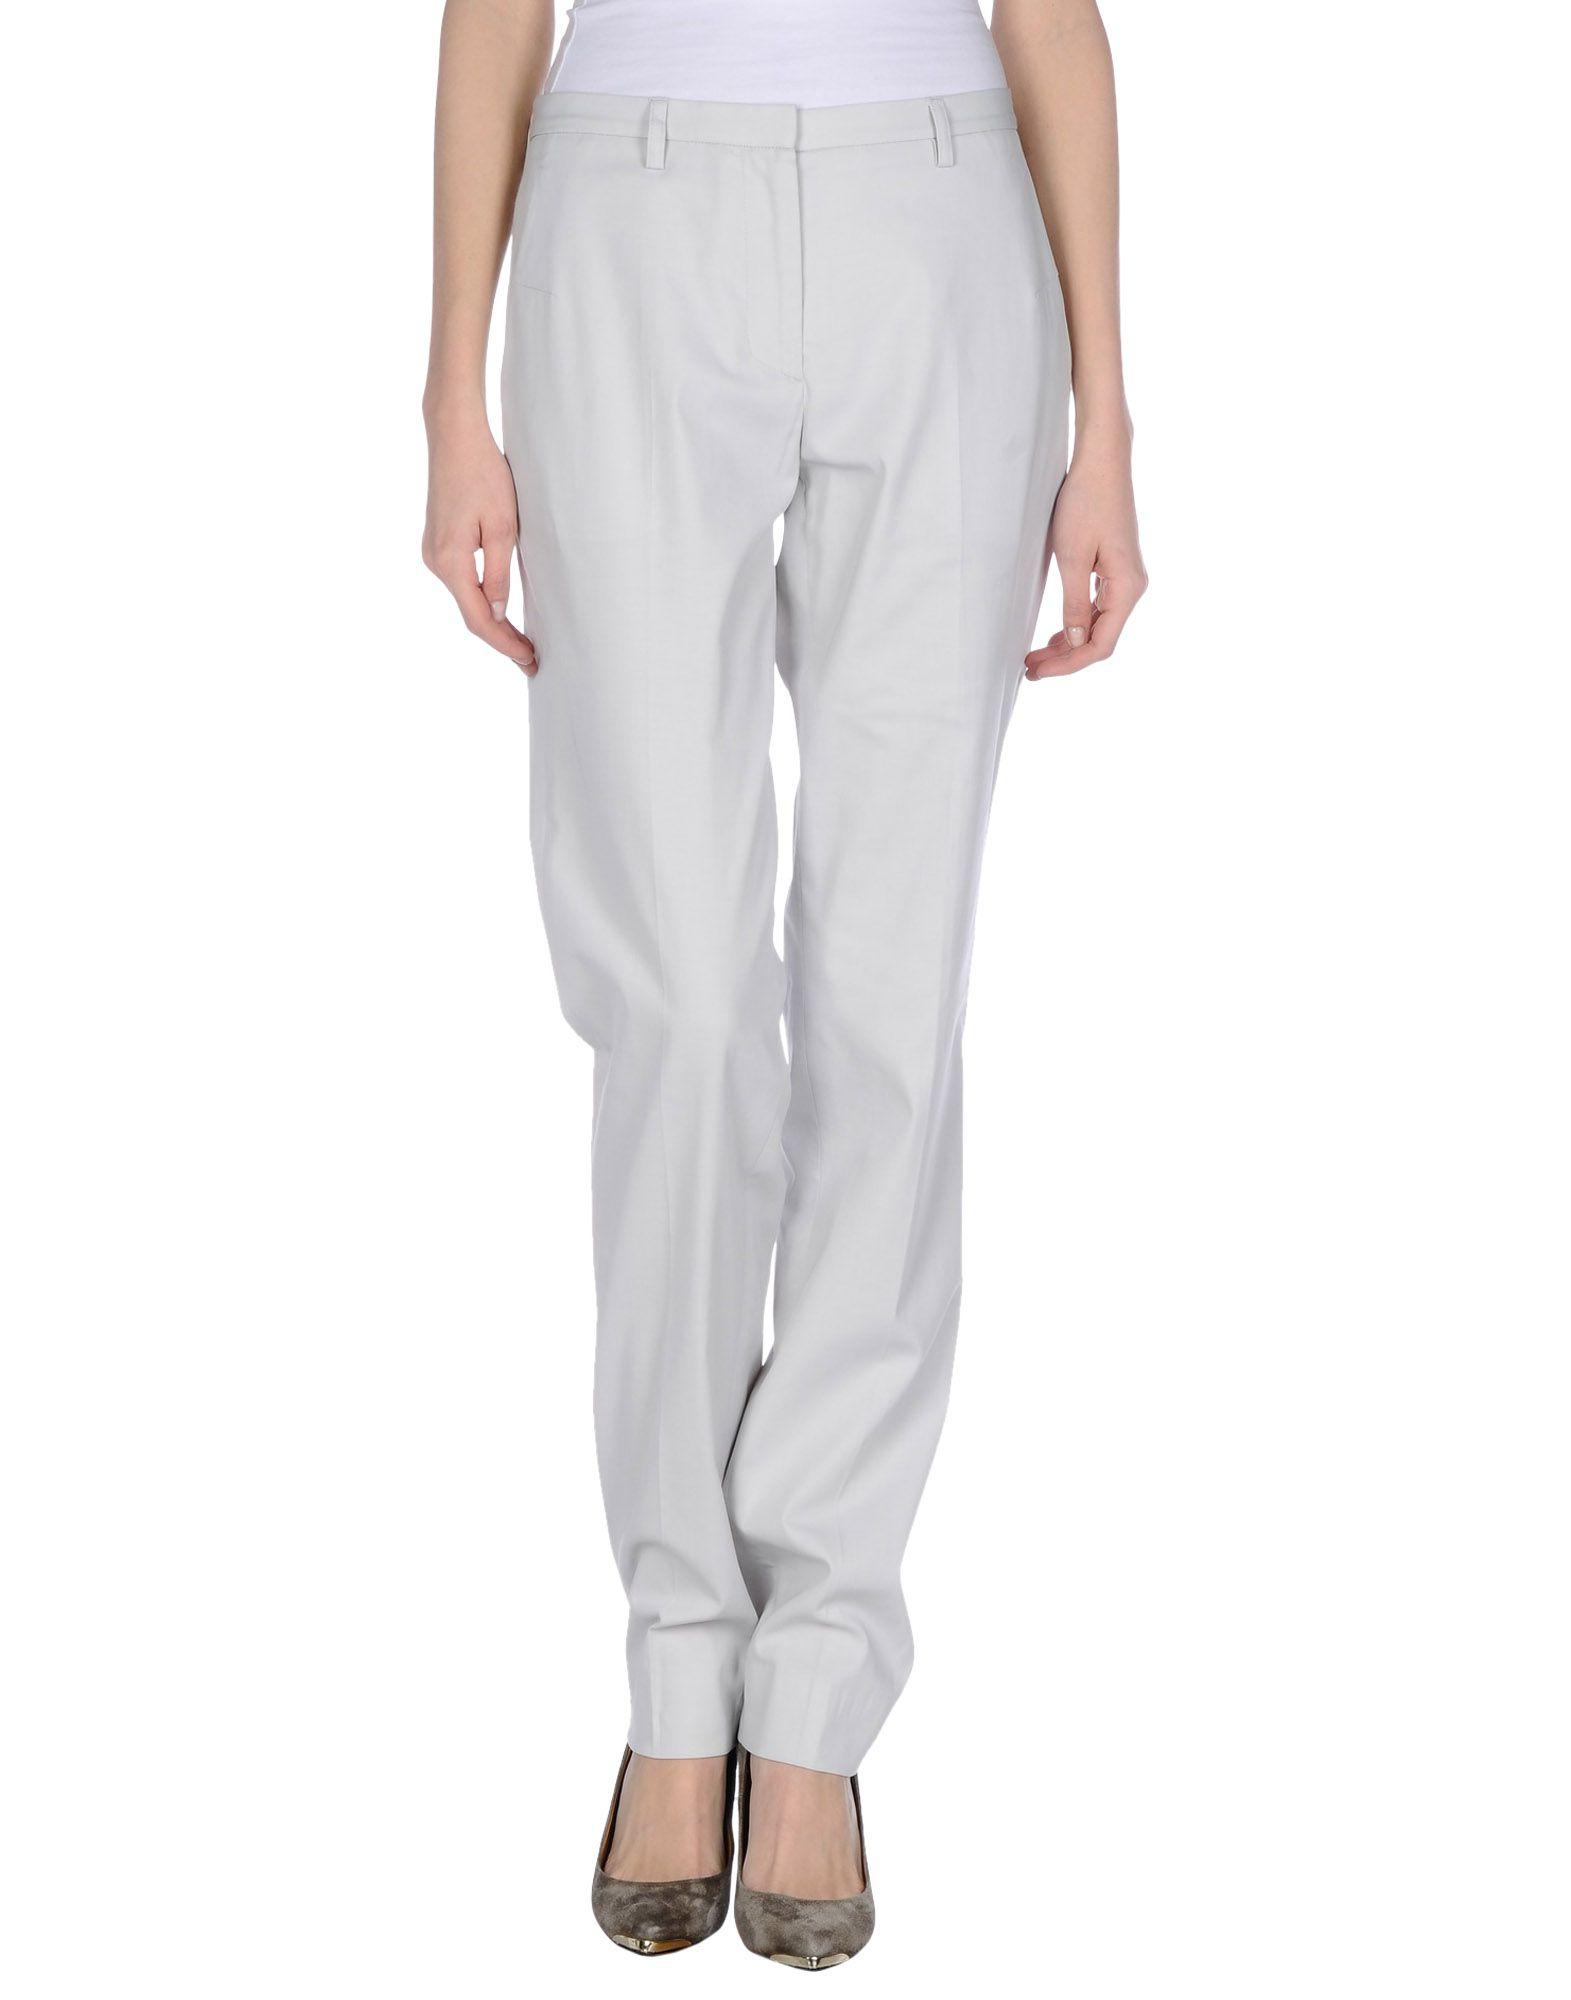 Maison Margiela Casual Pants In Gray Lyst